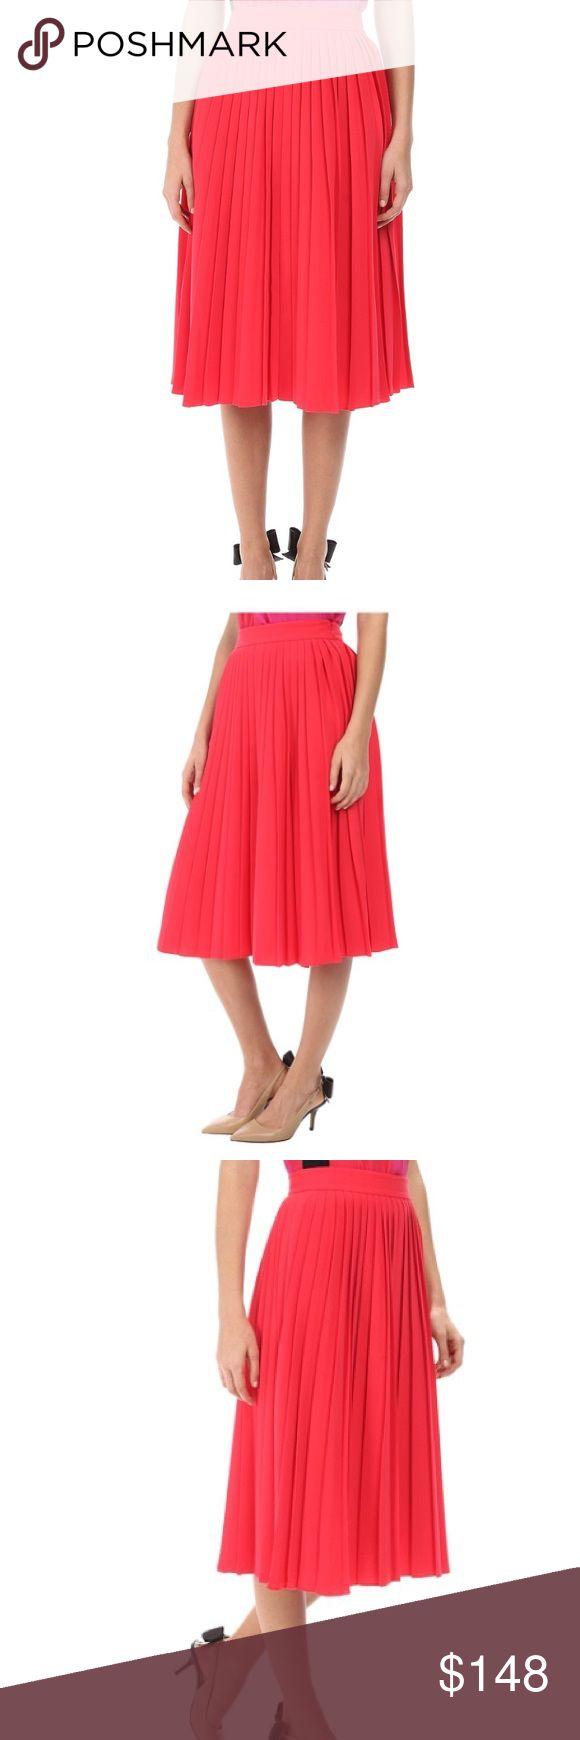 Kate Spade Accordion Aladdin Pink Pleated Skirt Beautiful hot pink pleated skirt by Kate Spade New York. Brand new with tags. kate spade Skirts Midi